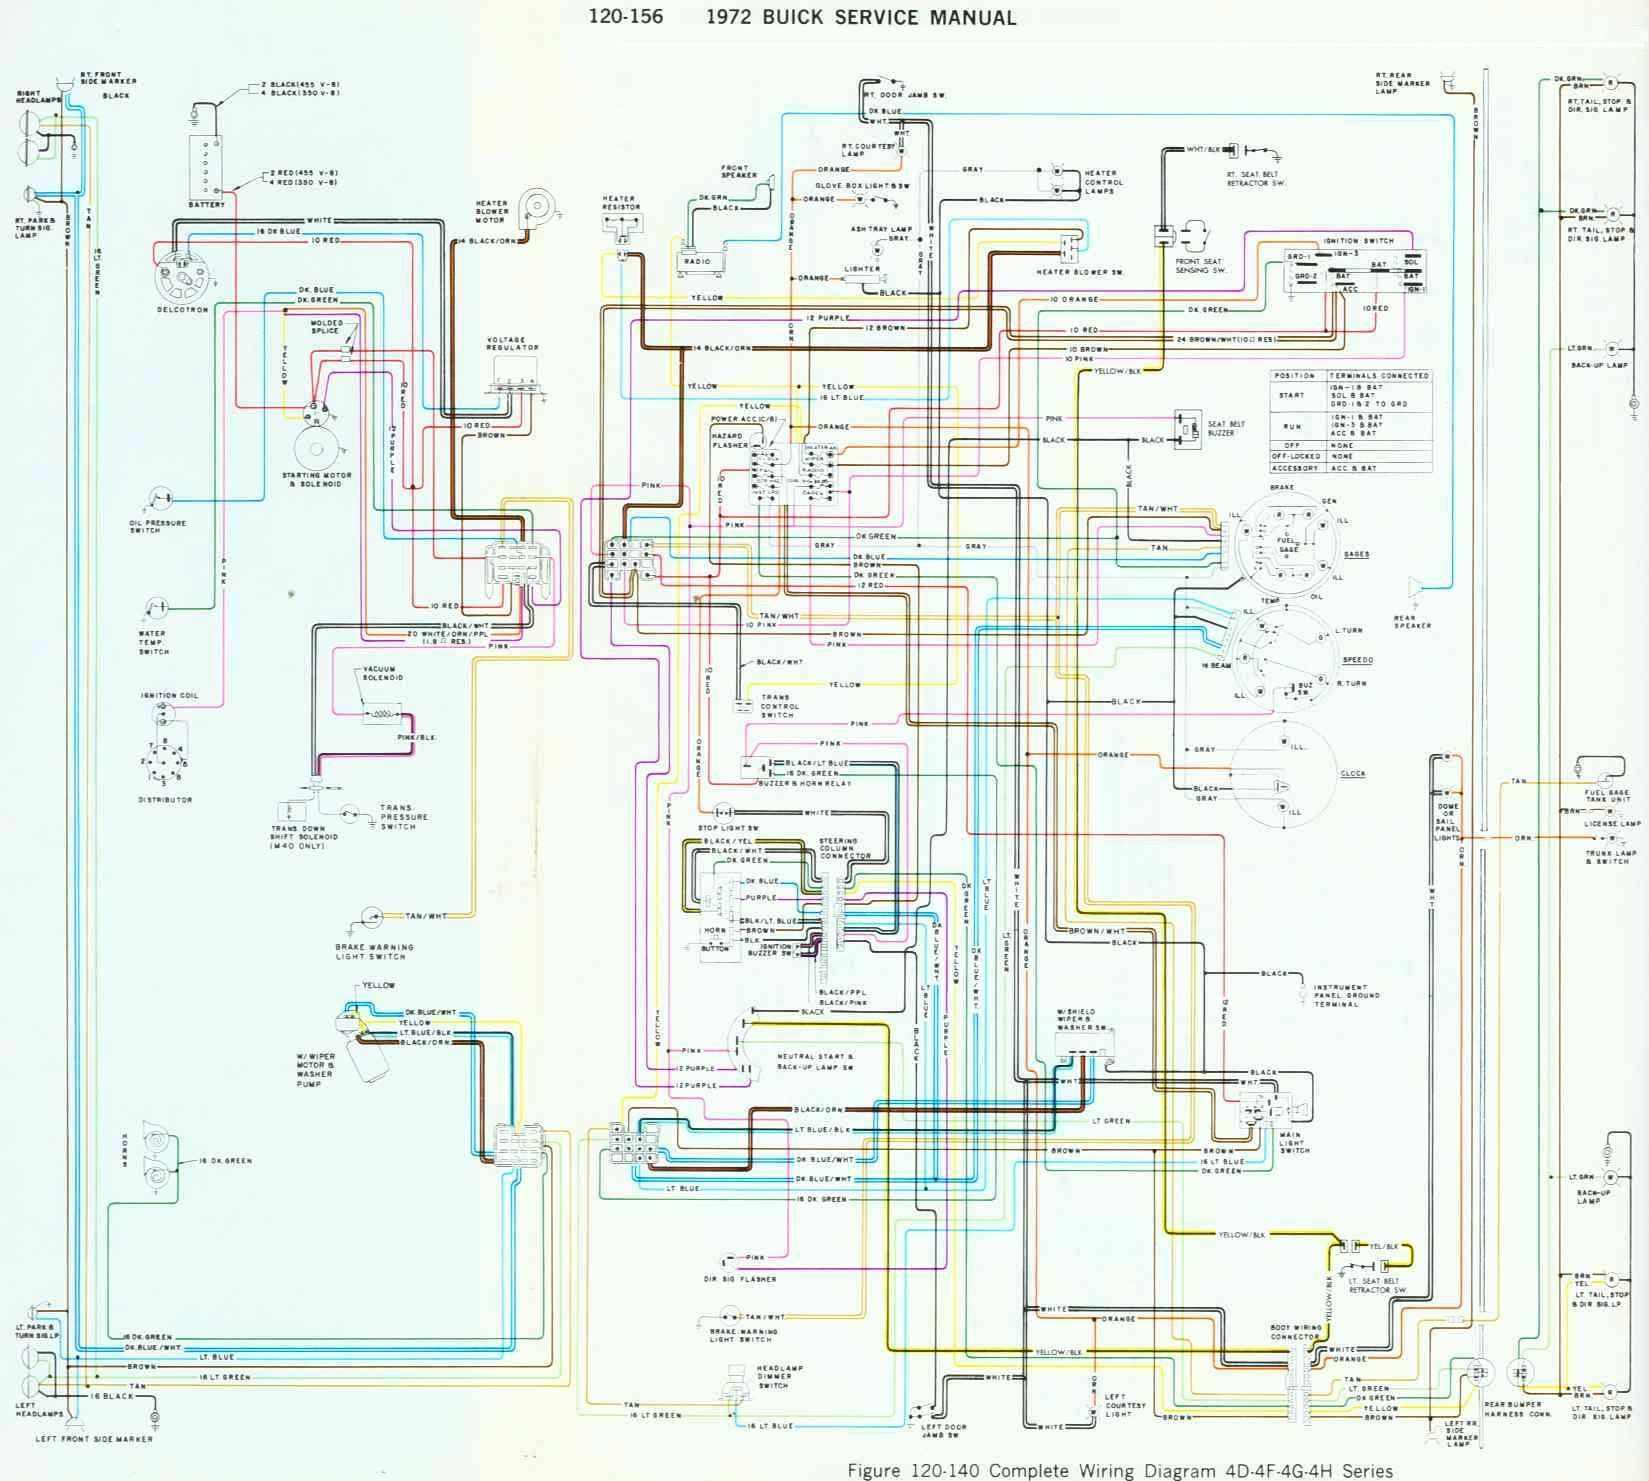 medium resolution of 96 buick ac wiring diagram schematic wiring diagrams u2022 1975 buick 1970 buick ac diagram